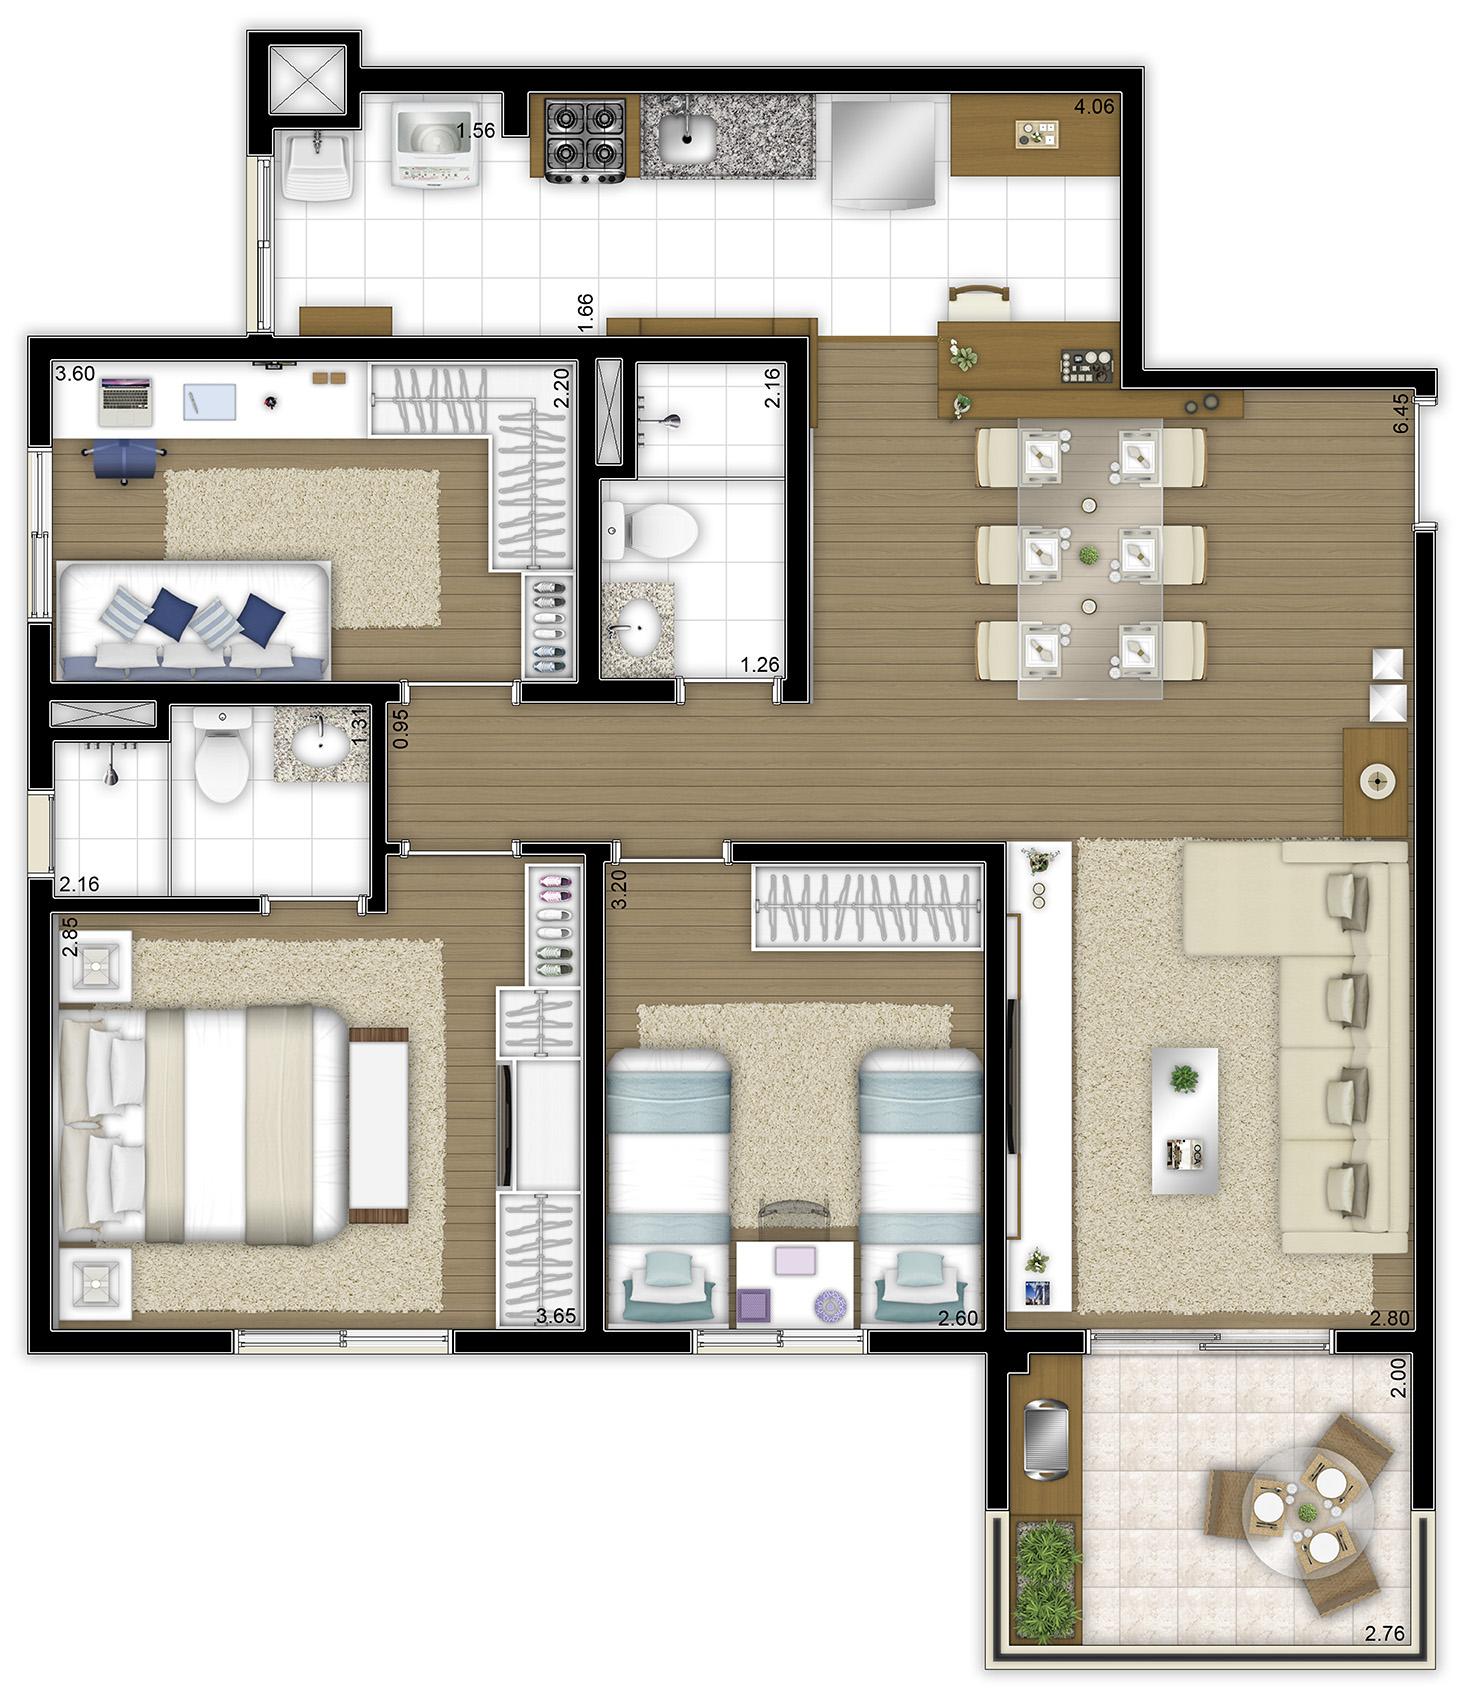 84,50 m² - 3 dorms